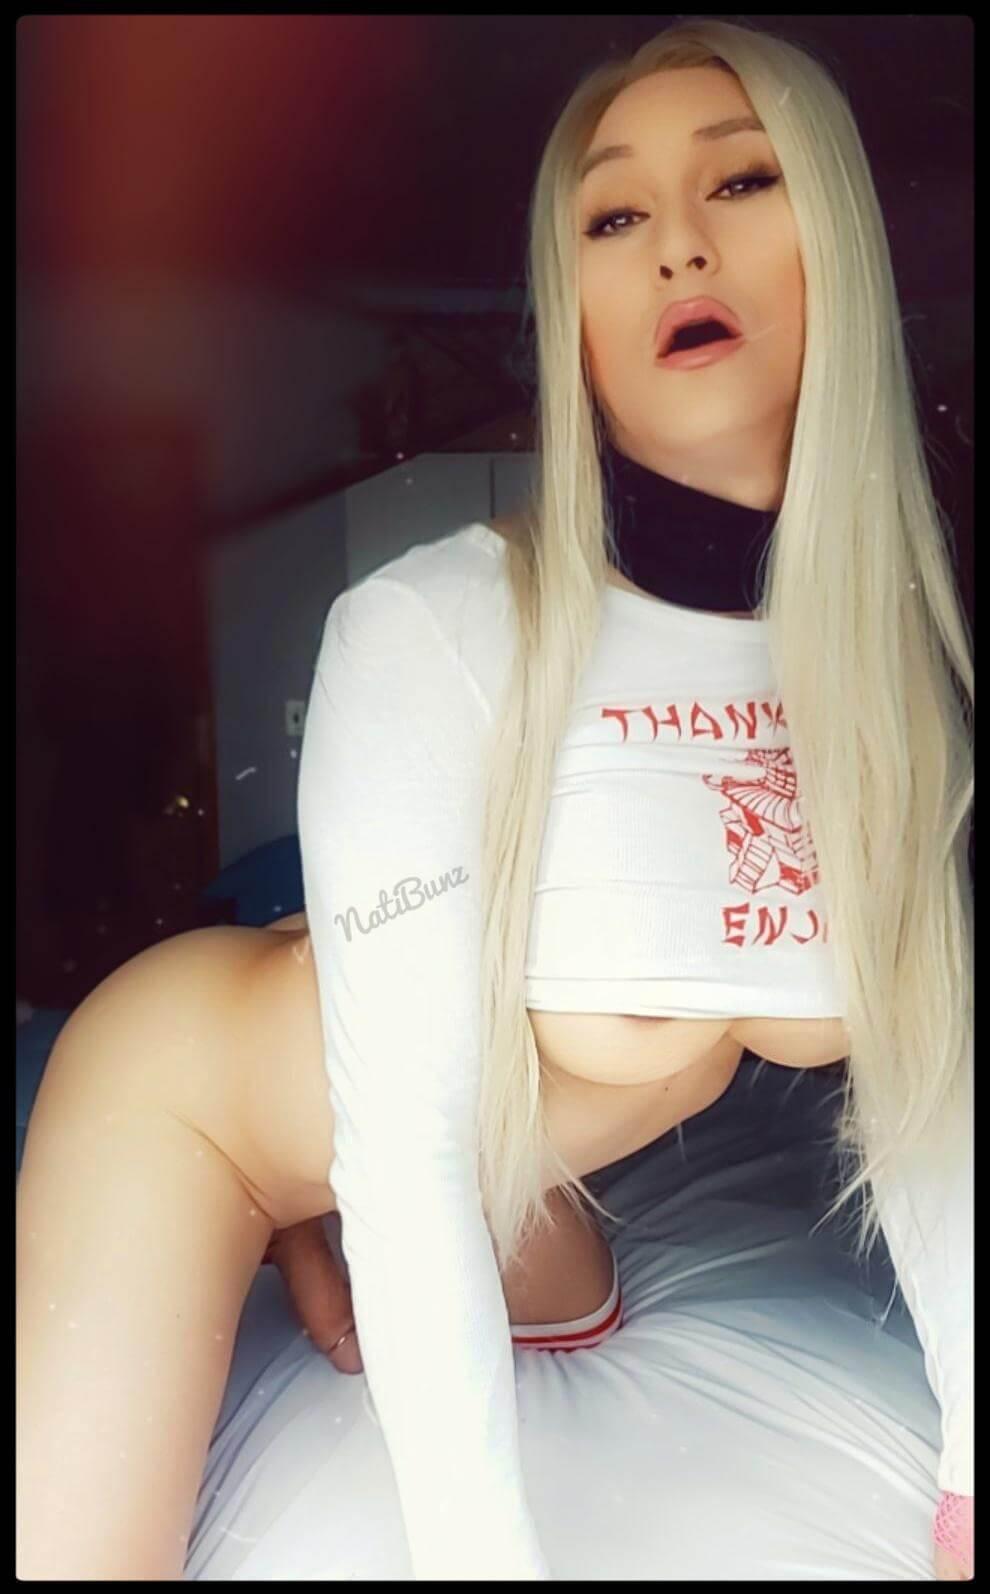 natali_marxxx chaturbate